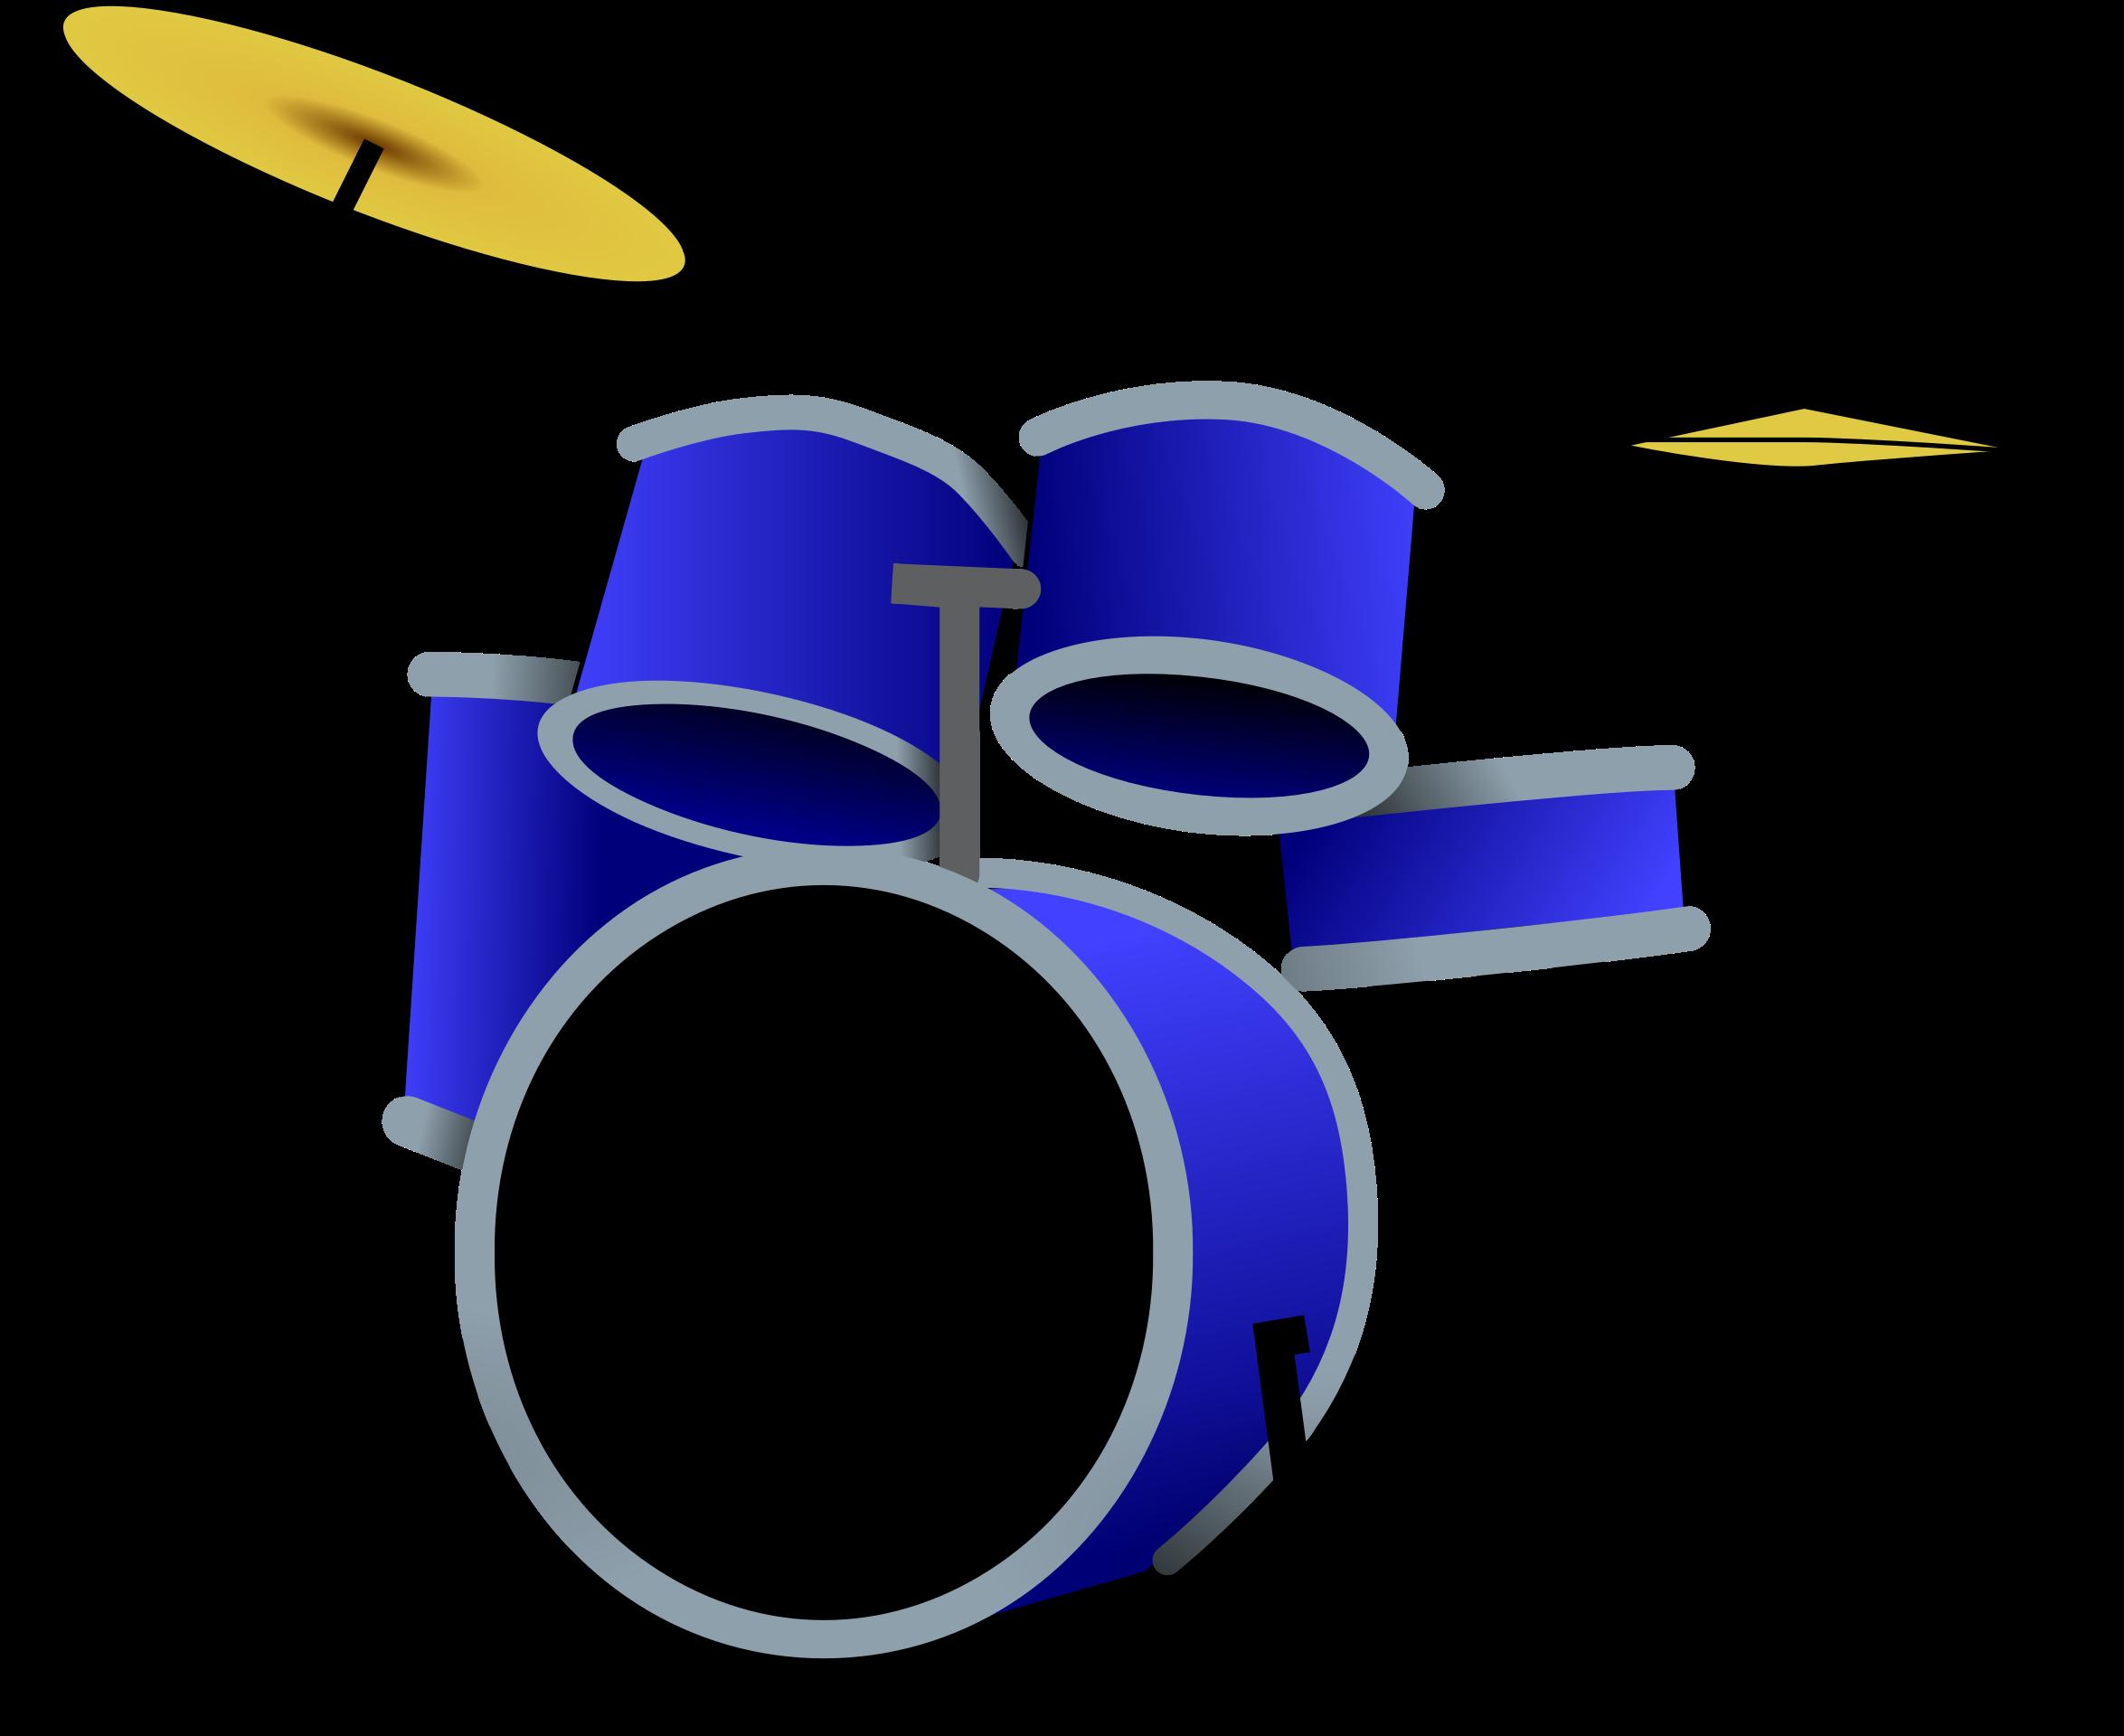 Png drum set cartoon. Drums clipart vocal music